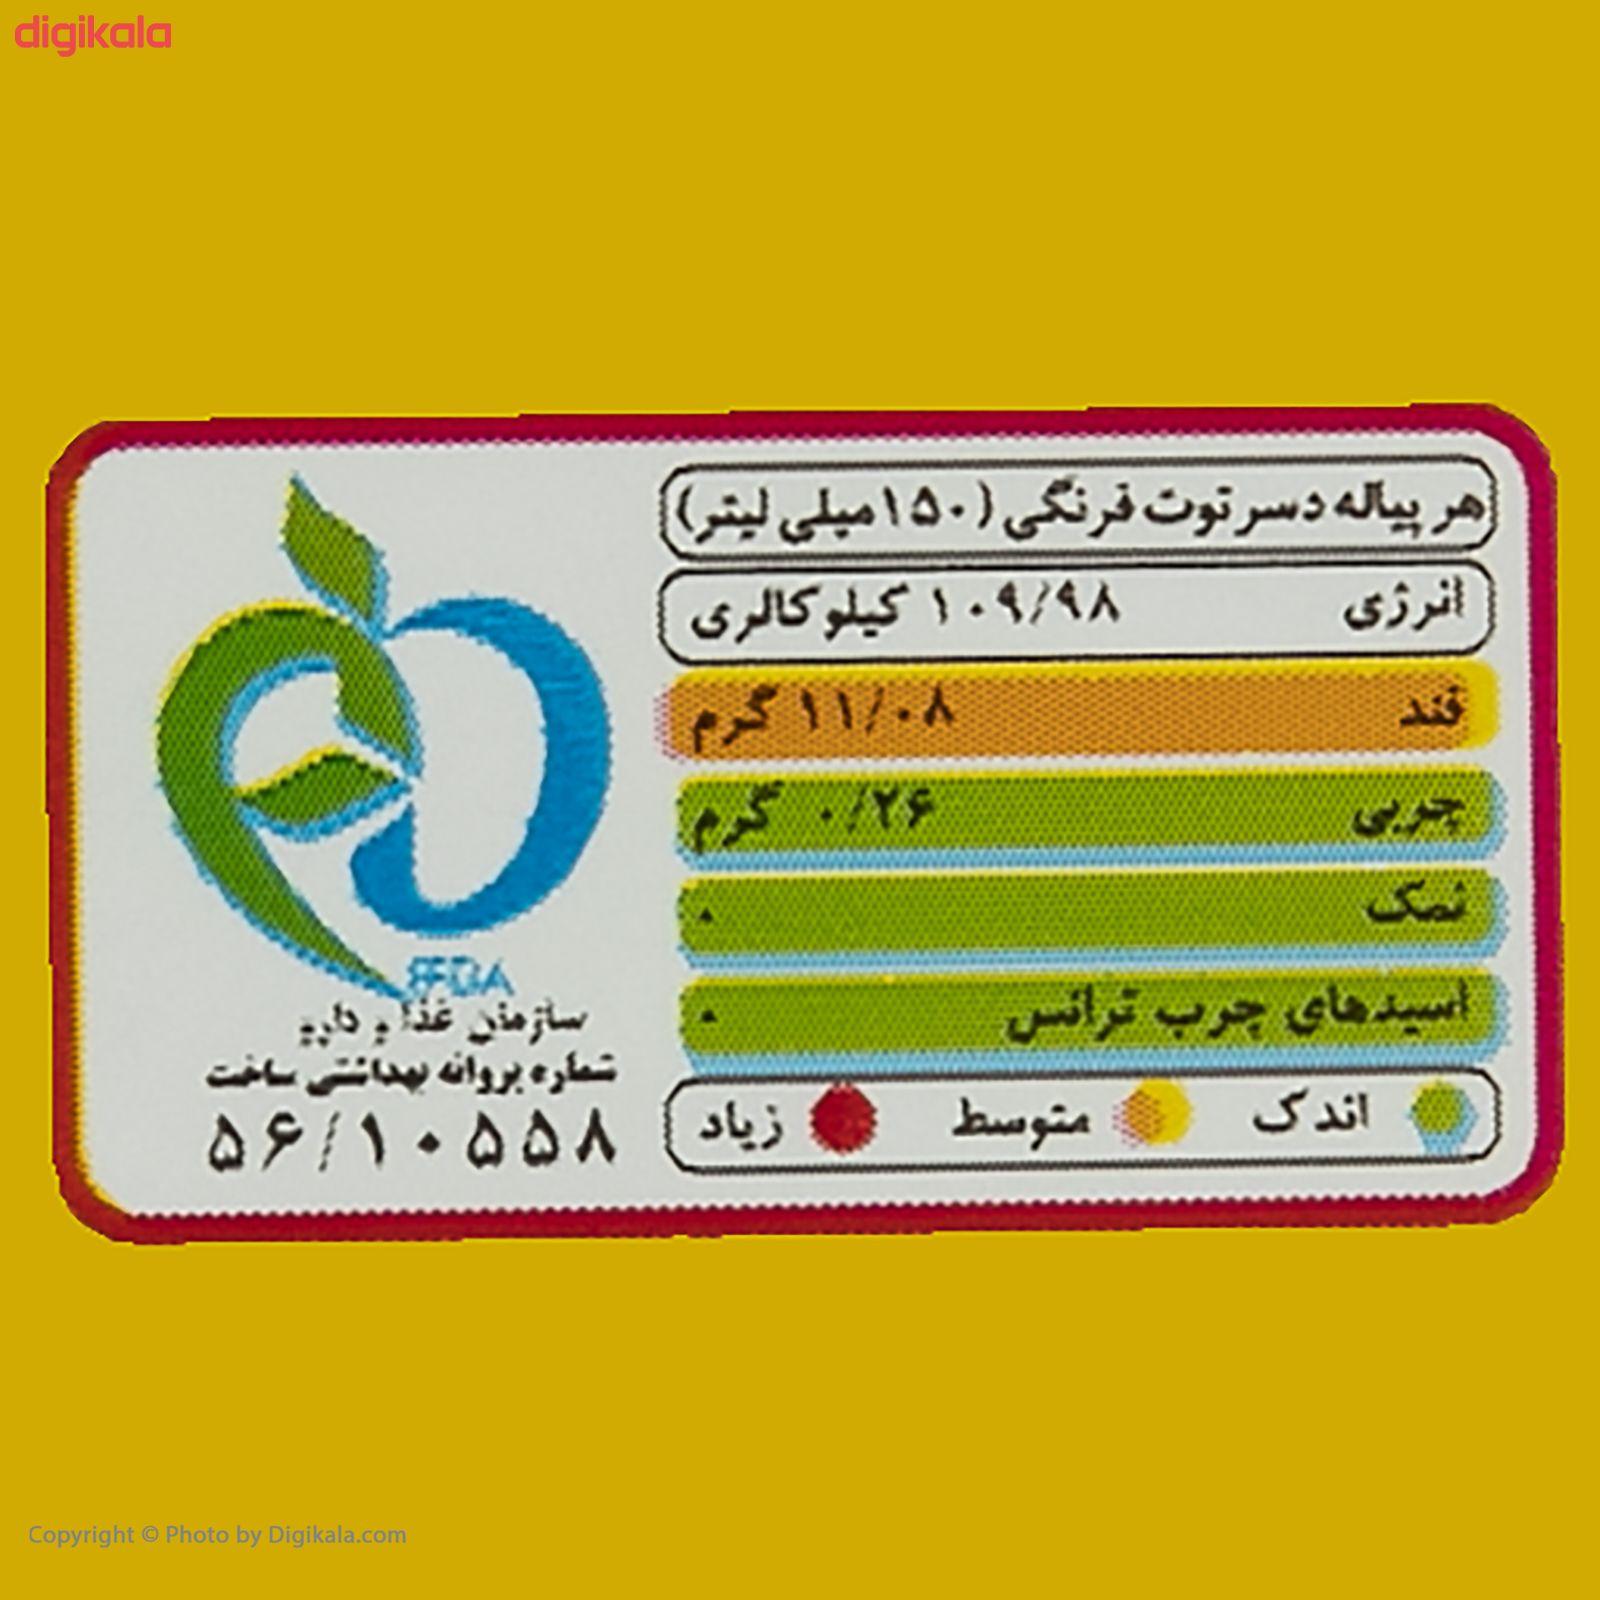 پودر پودینگ فوری کوپا با طعم توت فرنگی - 100 گرم main 1 3